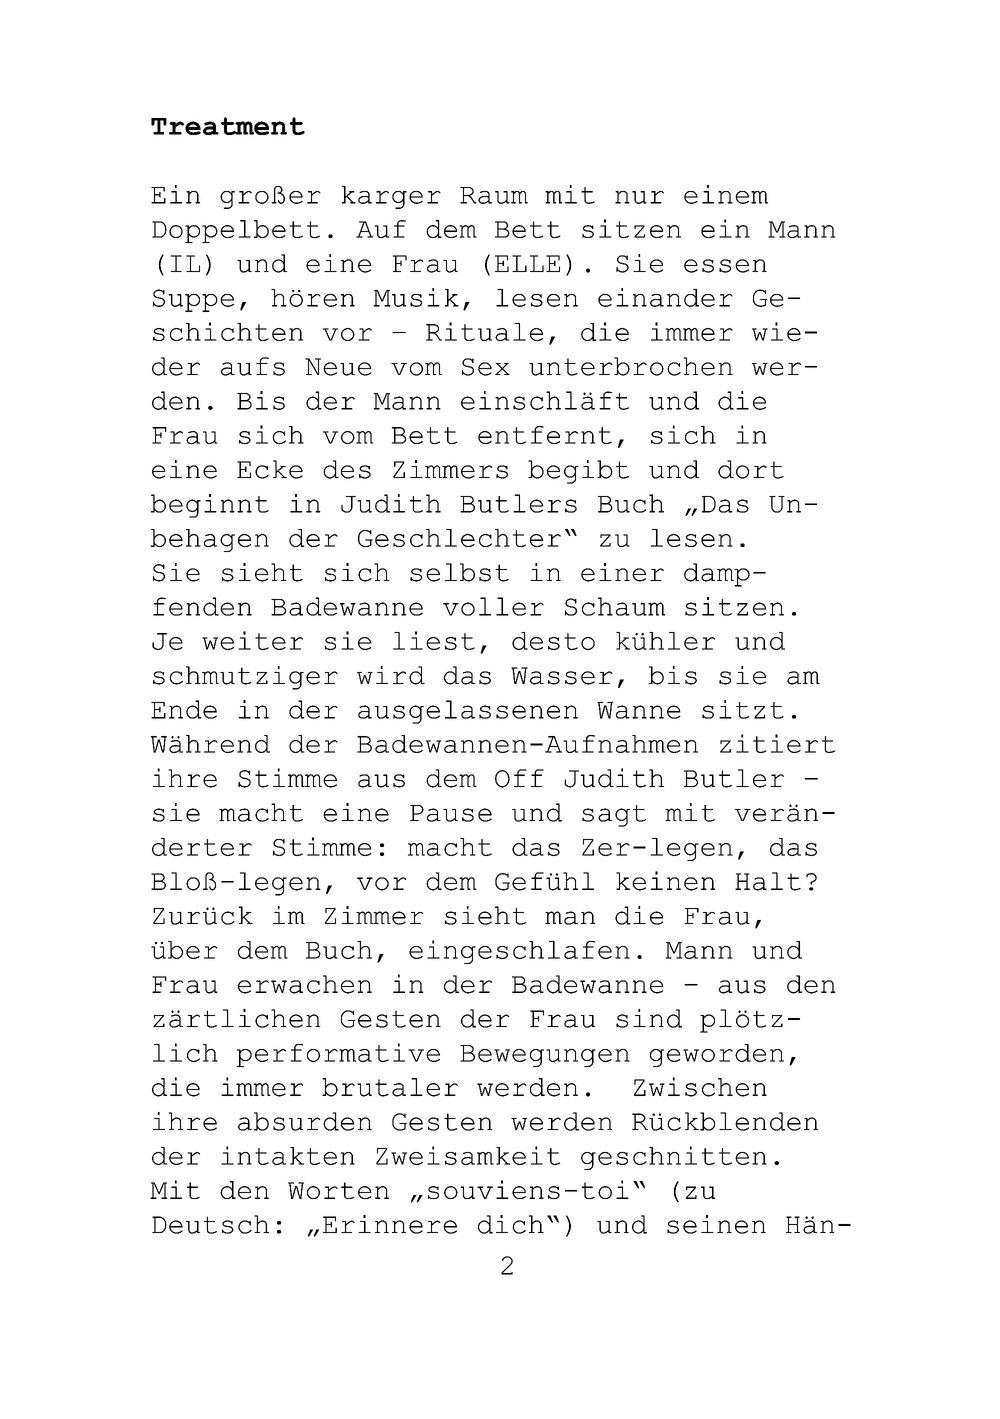 screenplay-wenn-judith-butler-sich-zu-uns-legt2-6992x9921-81.jpg